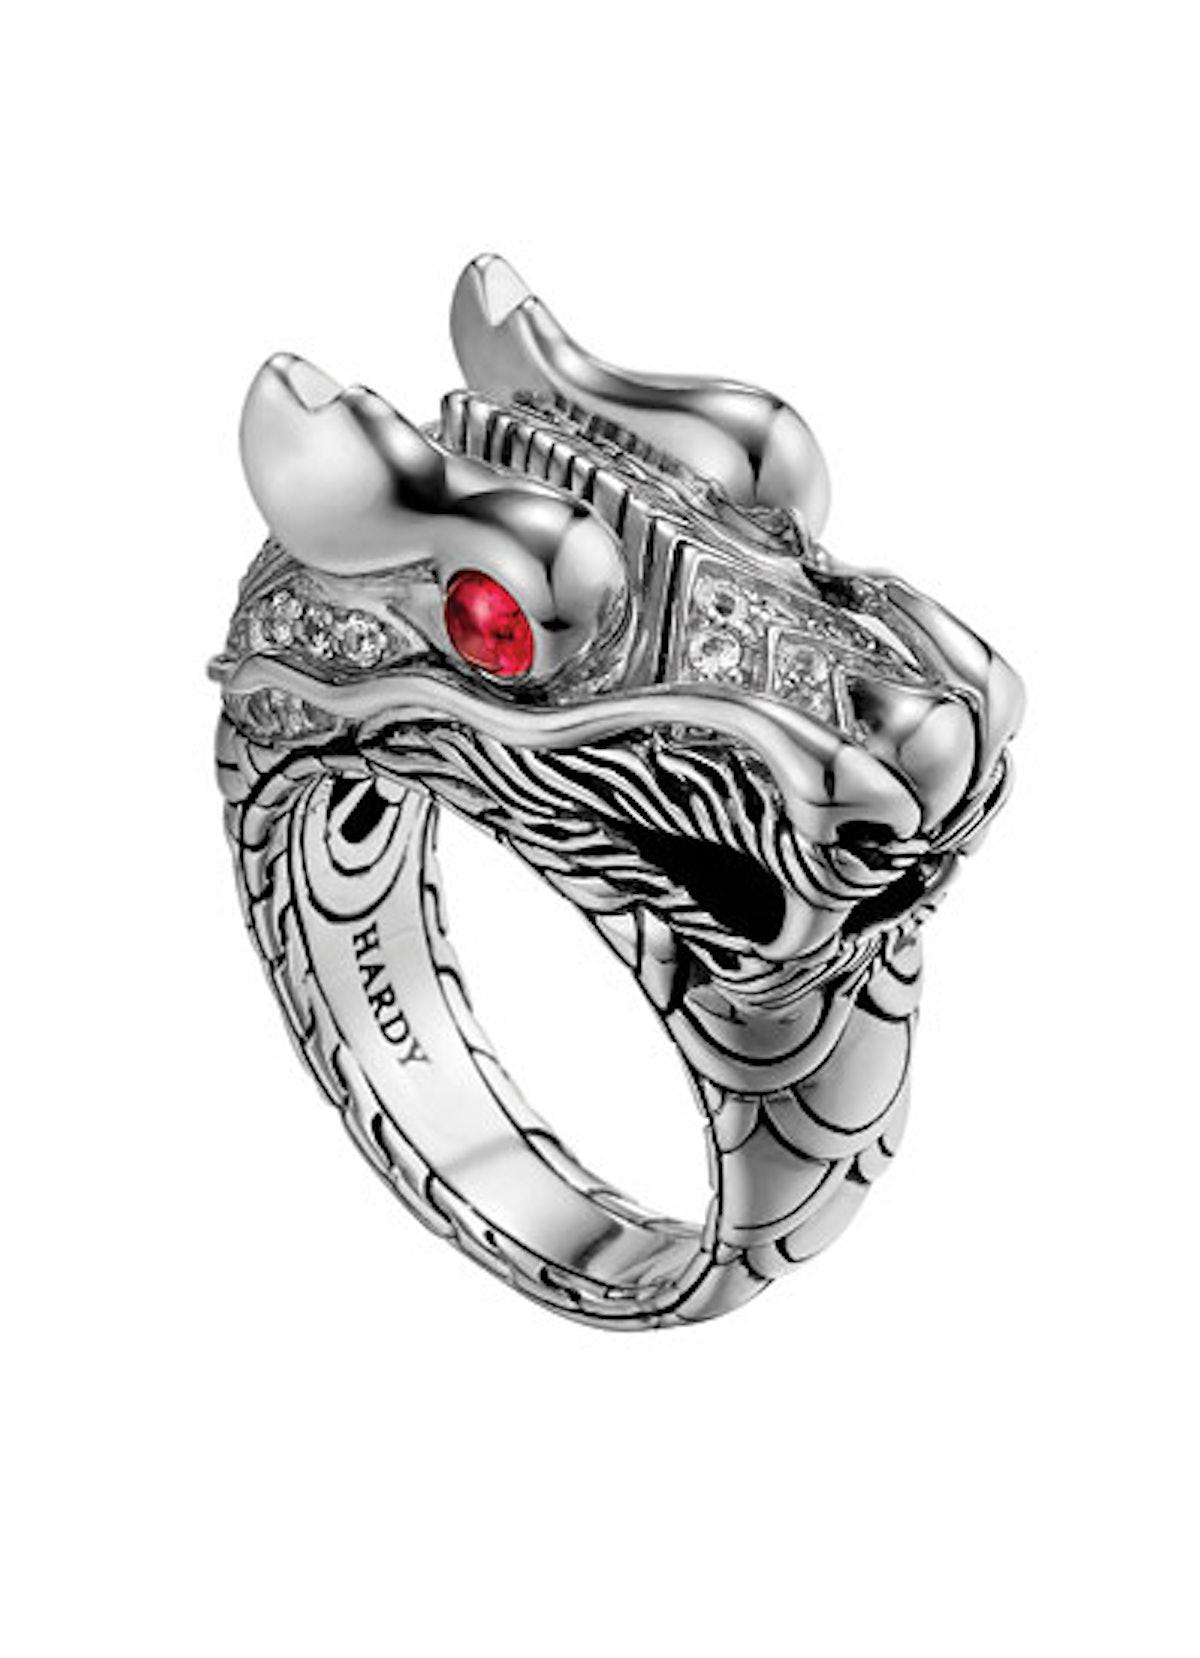 acss-dragon-inspired-jewelry-01-v.jpg